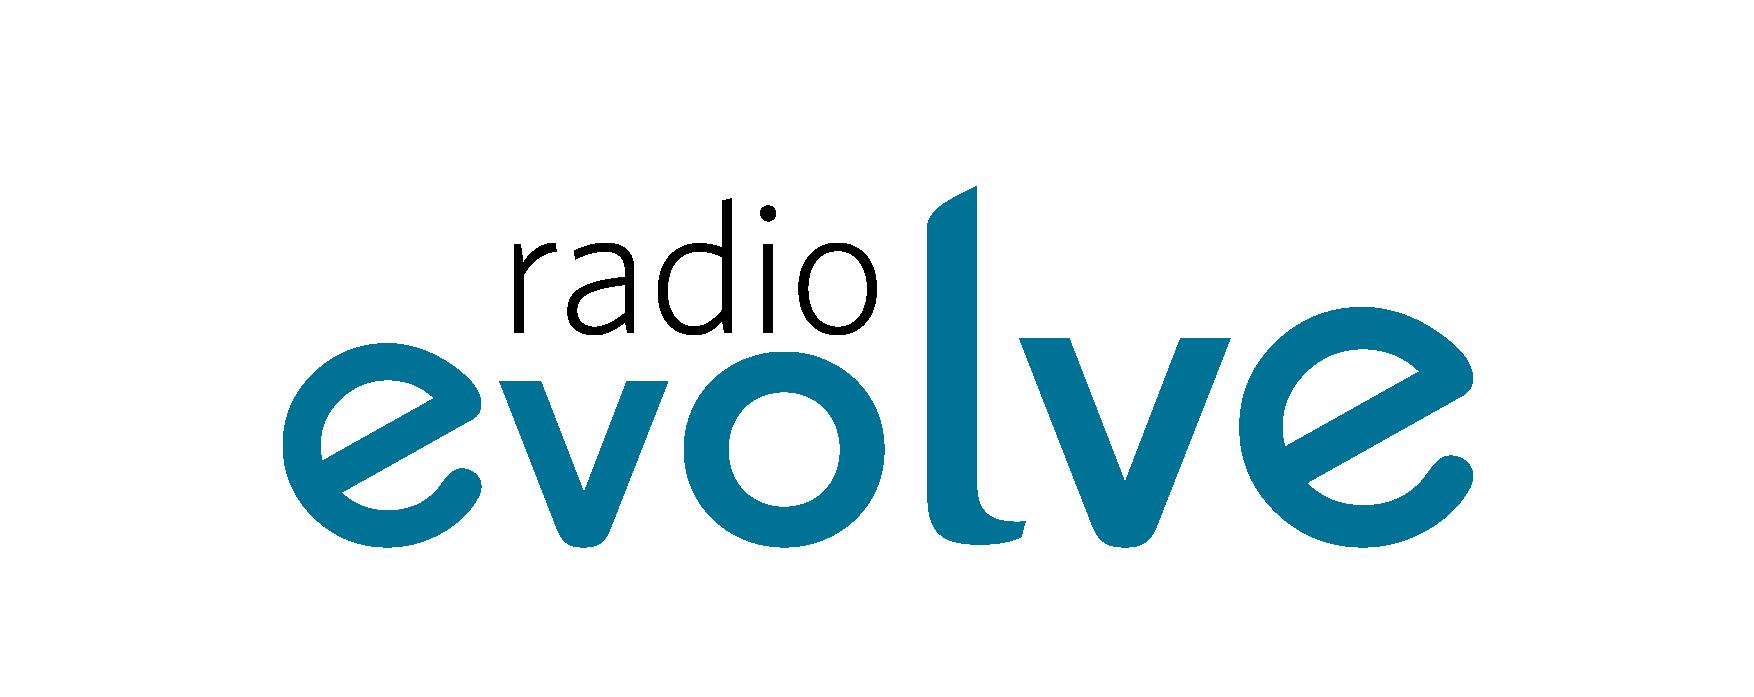 radio evolve FINAL WEB transparent